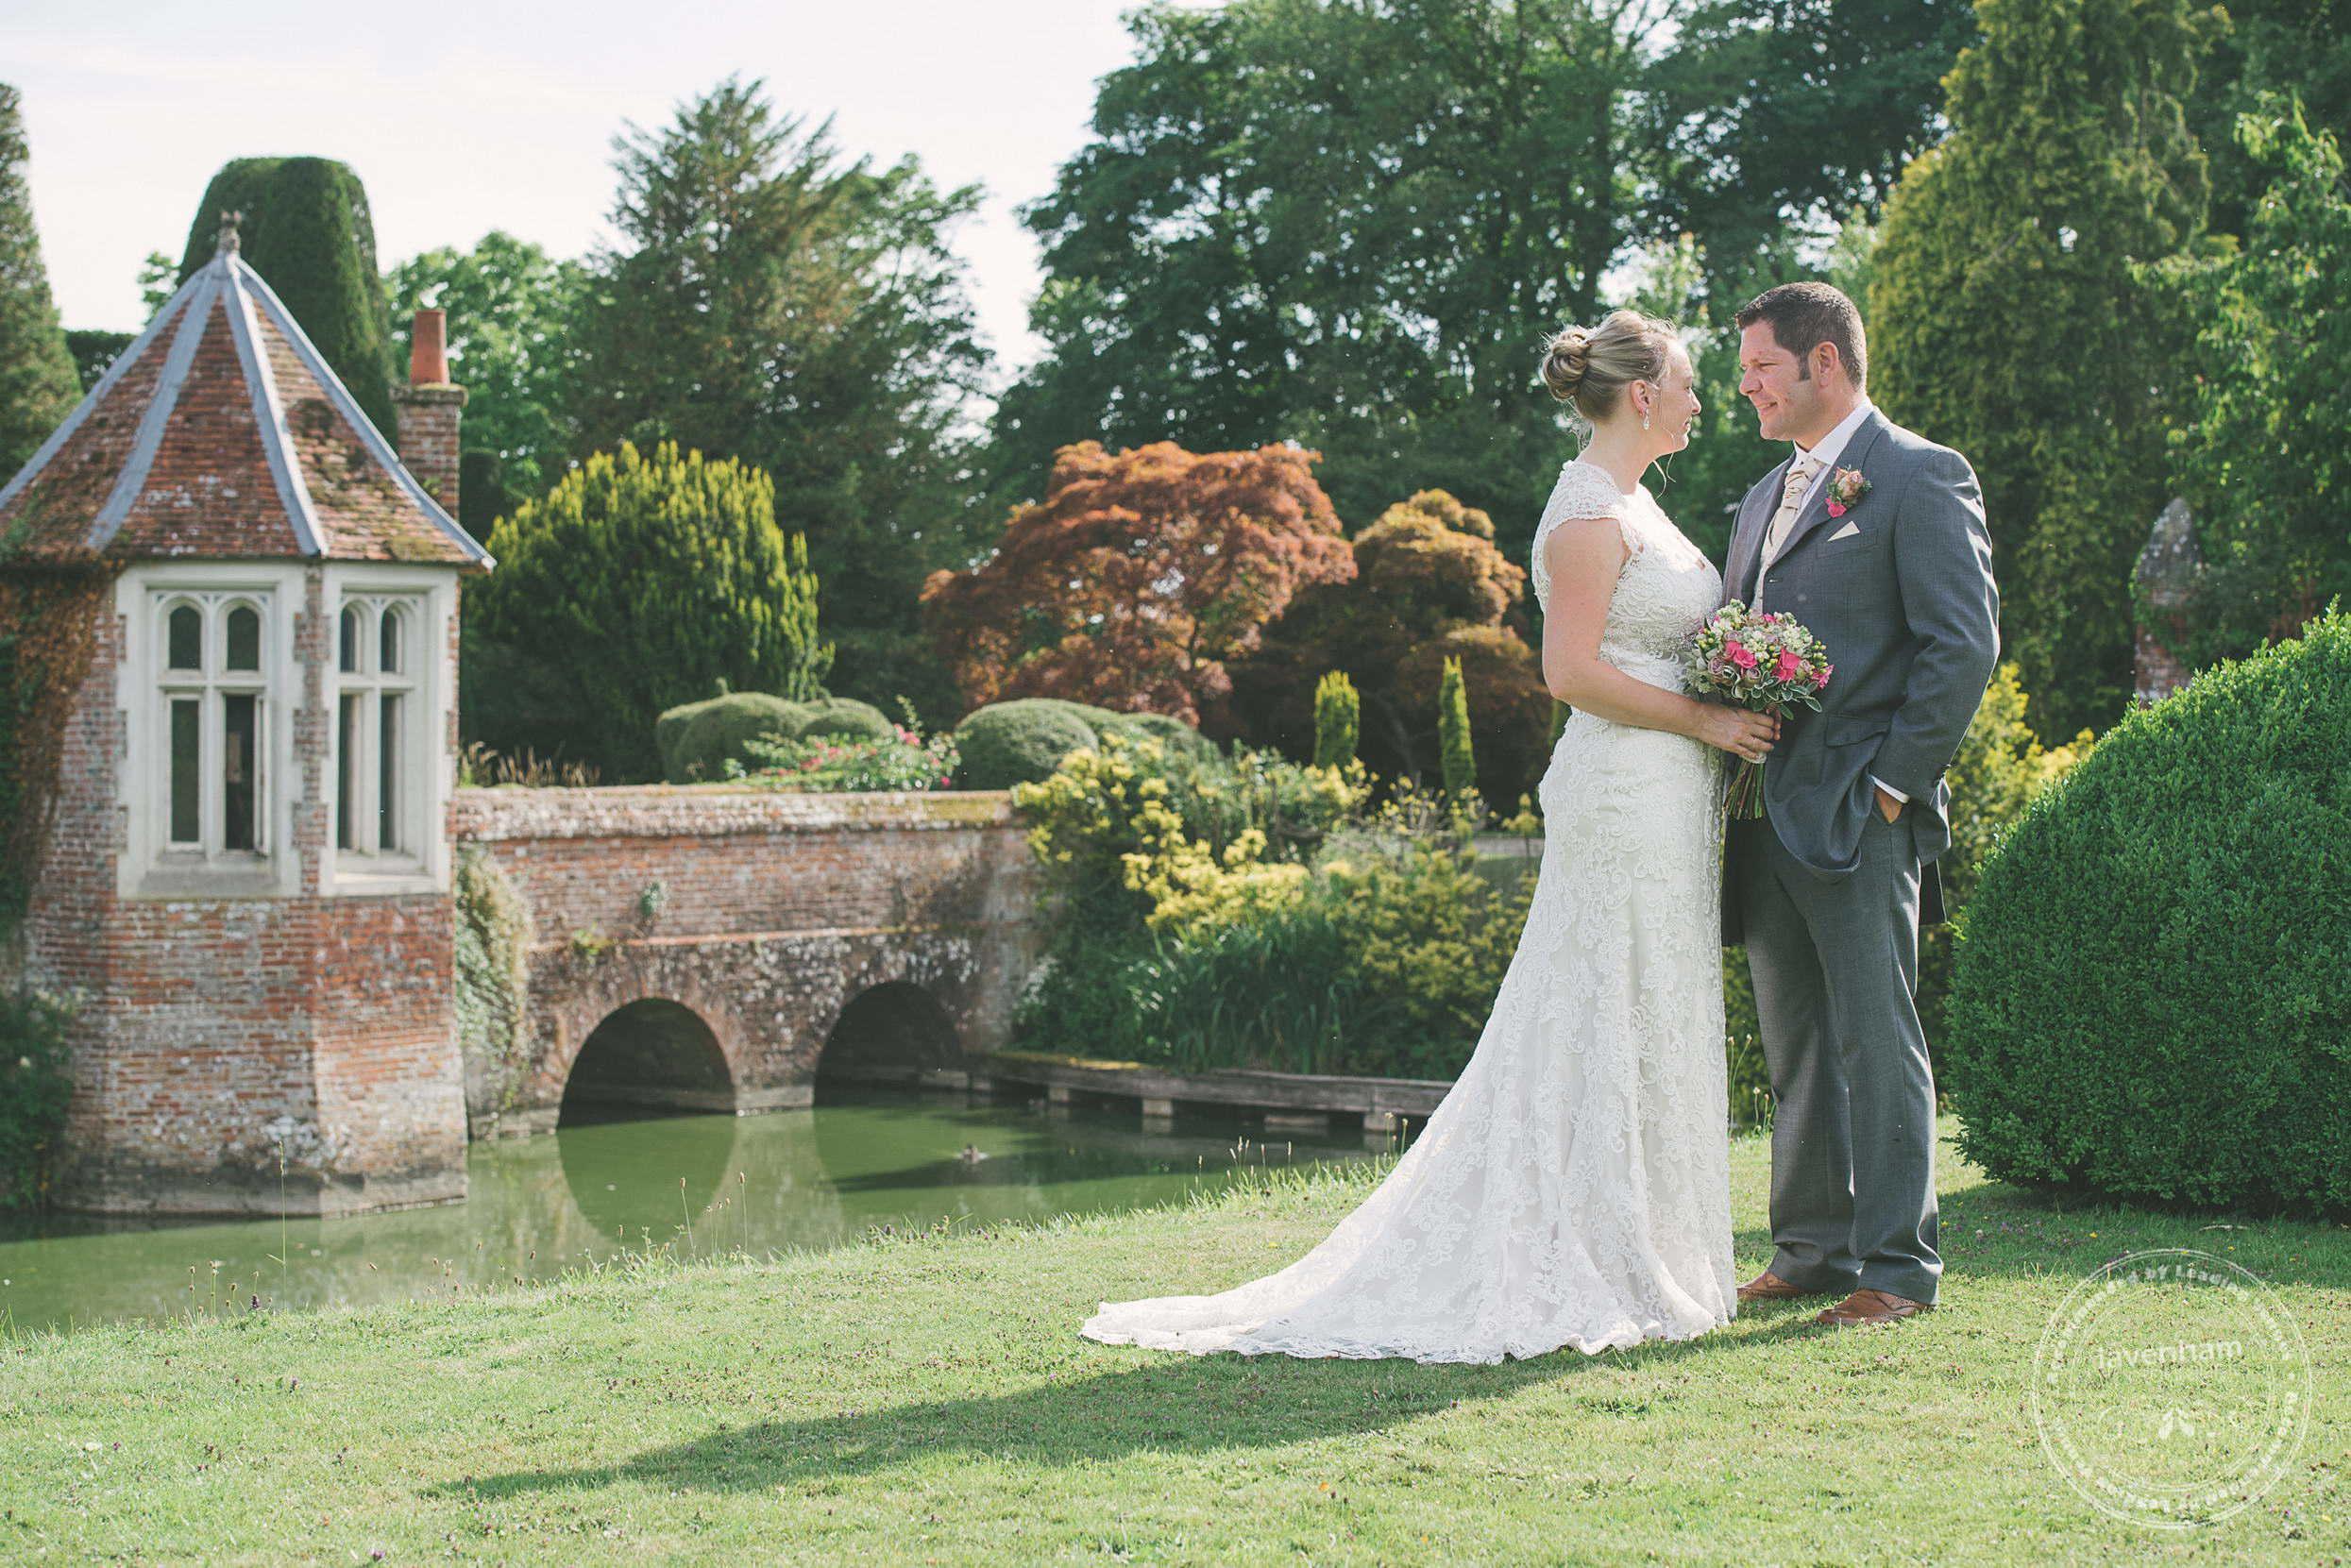 180715-kentwell-hall-wedding-photographer-035